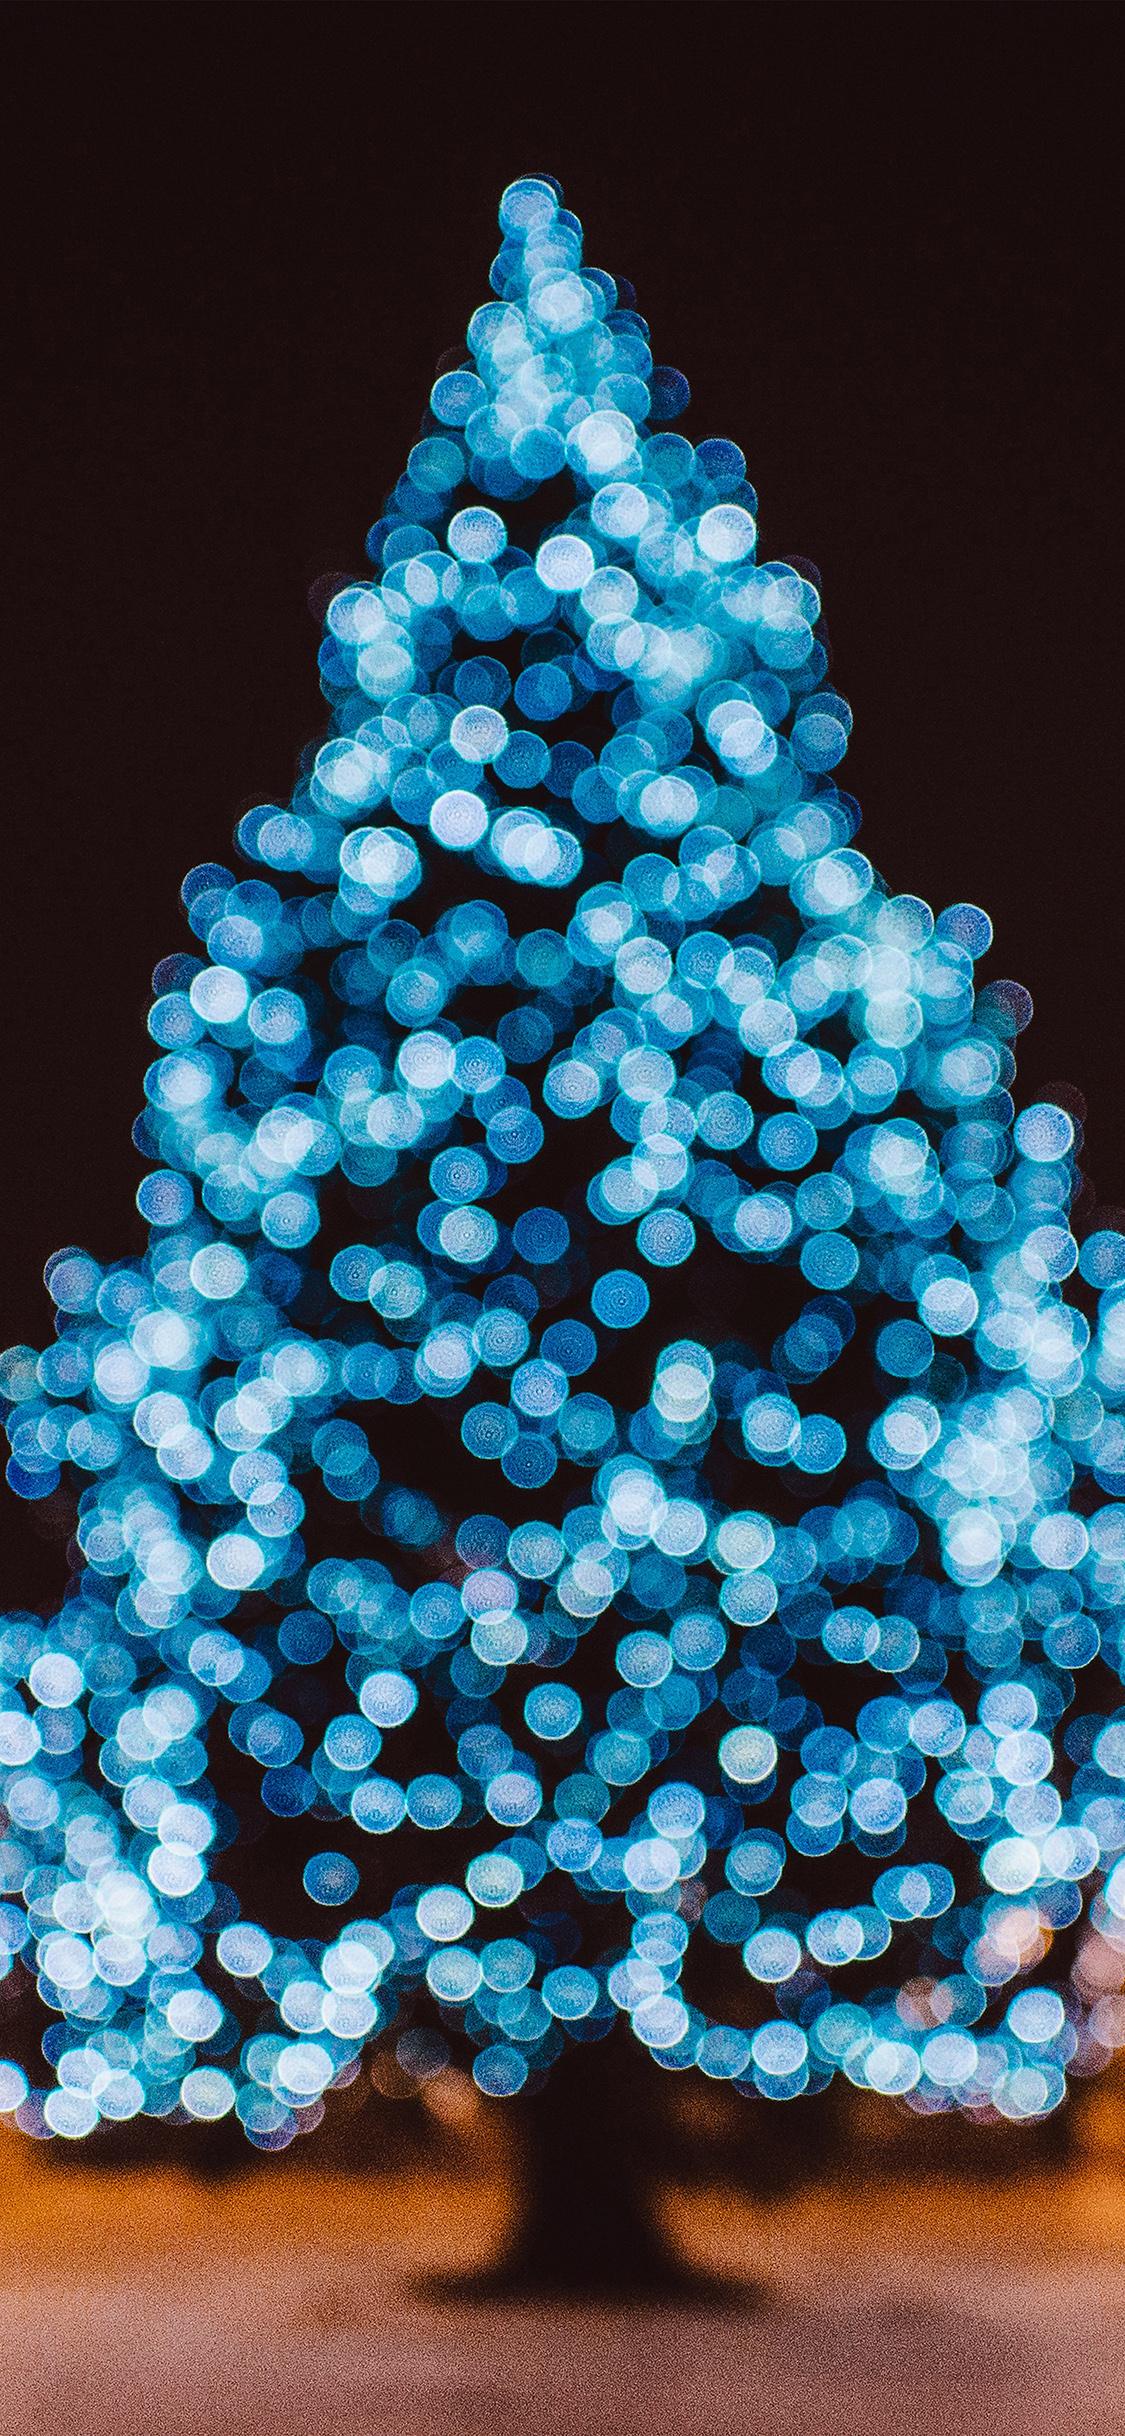 city tree bokeh christmas iphone wallpaper